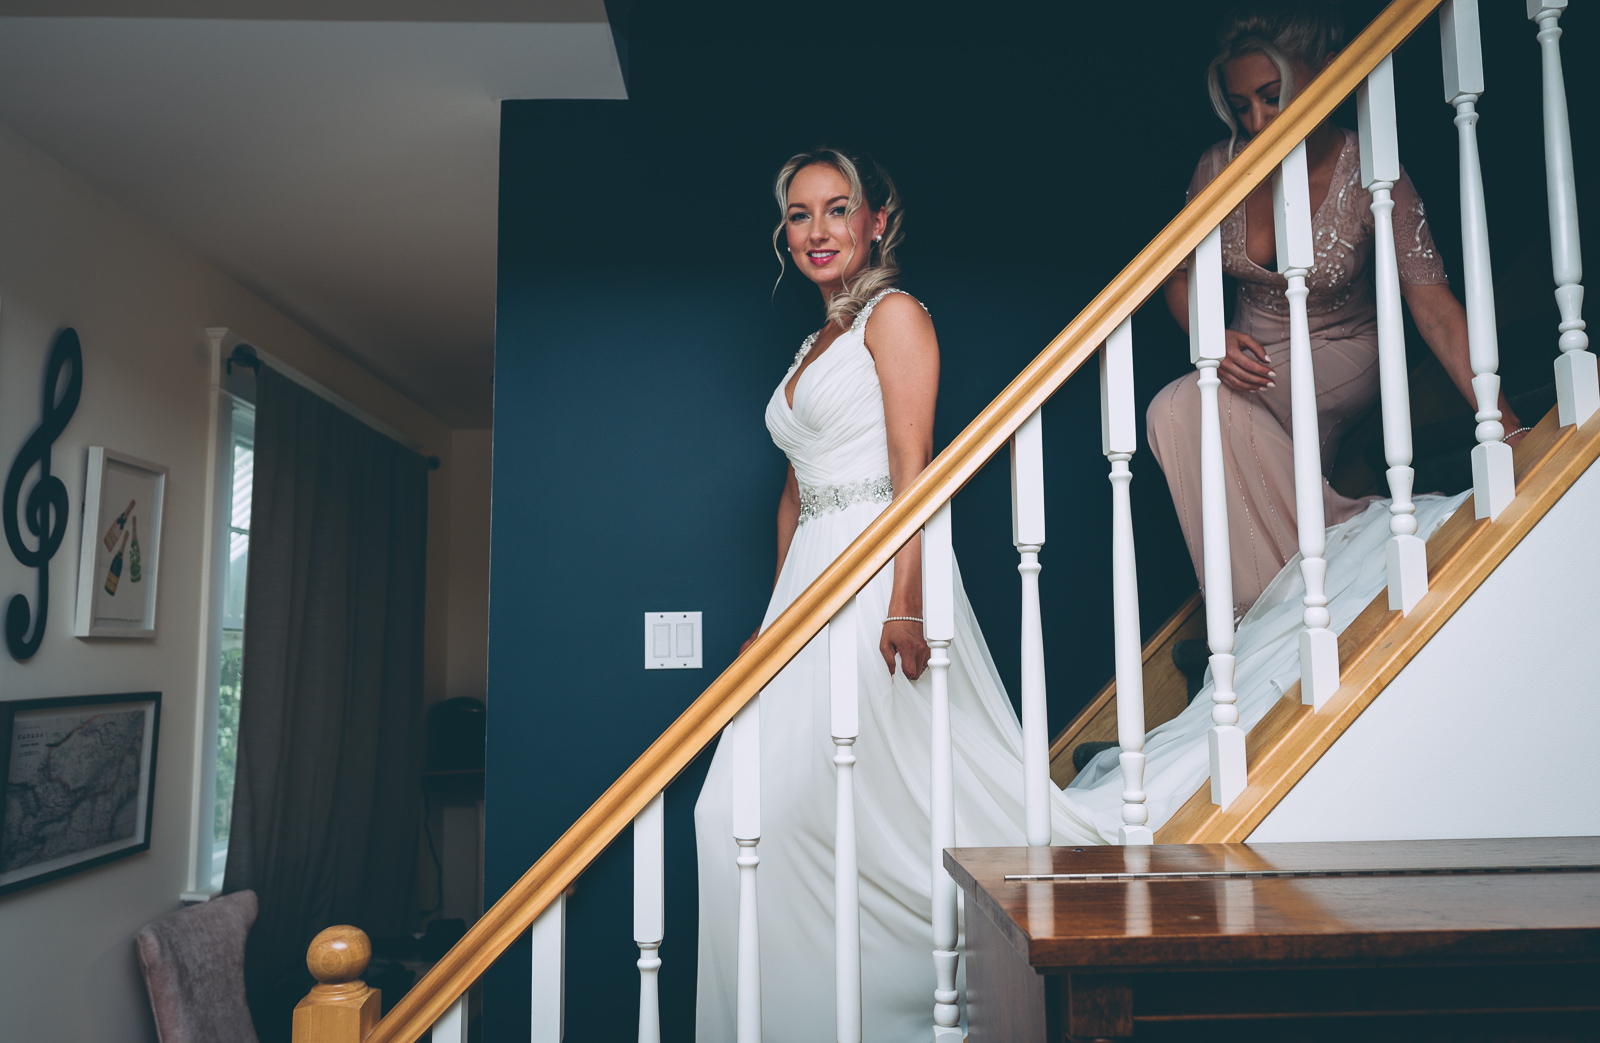 emily-jared-wedding-blog-18.jpg